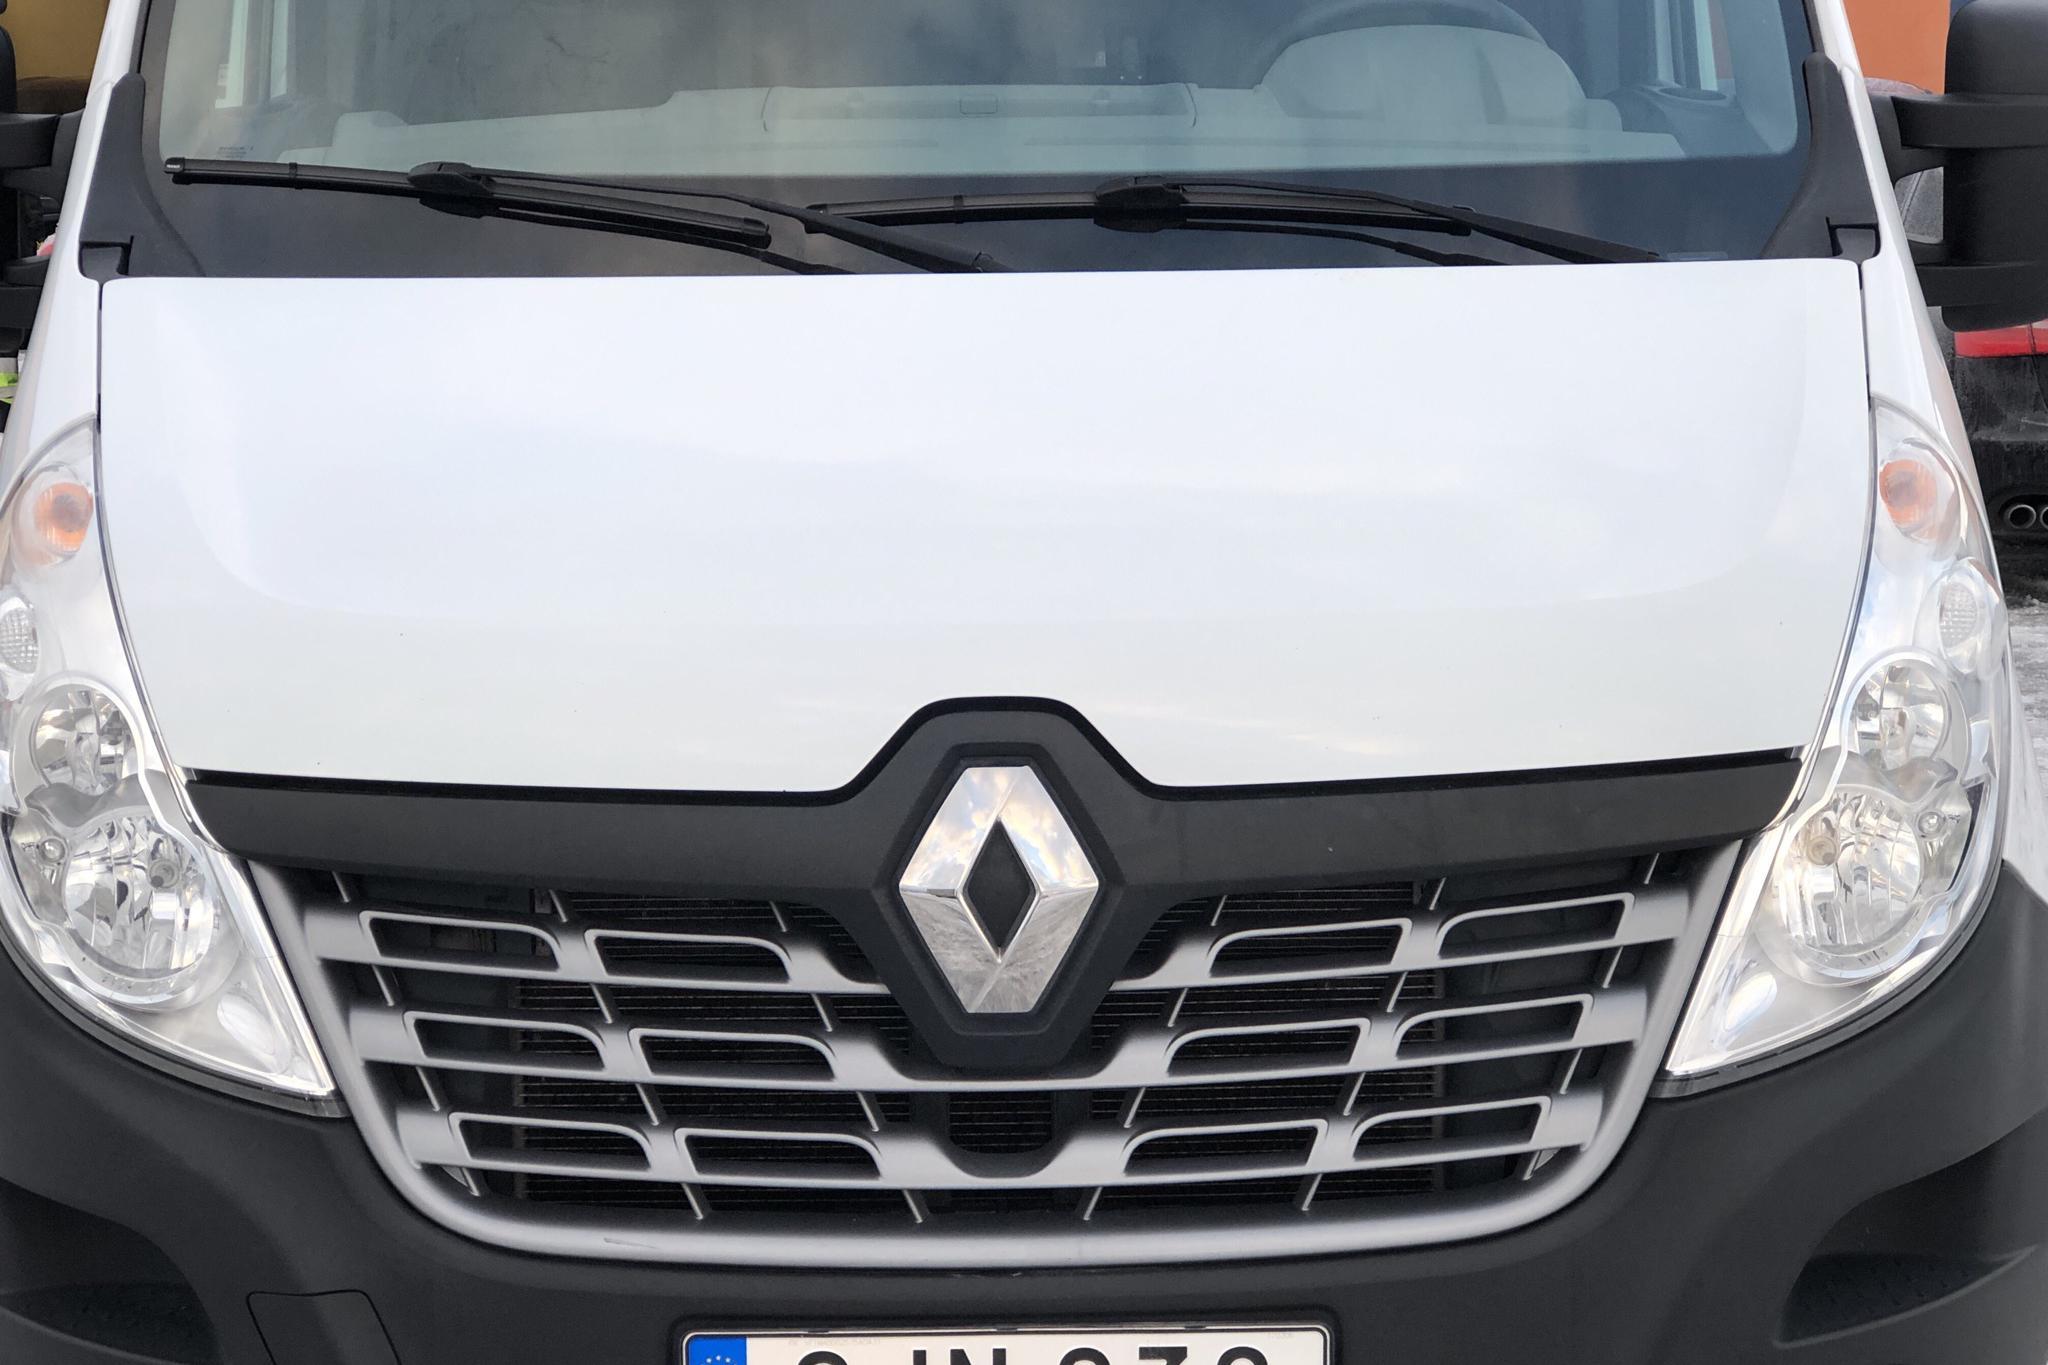 Renault Master 2.3 dCi FAP 2WD (170hk) - 3 536 mil - Manuell - vit - 2017